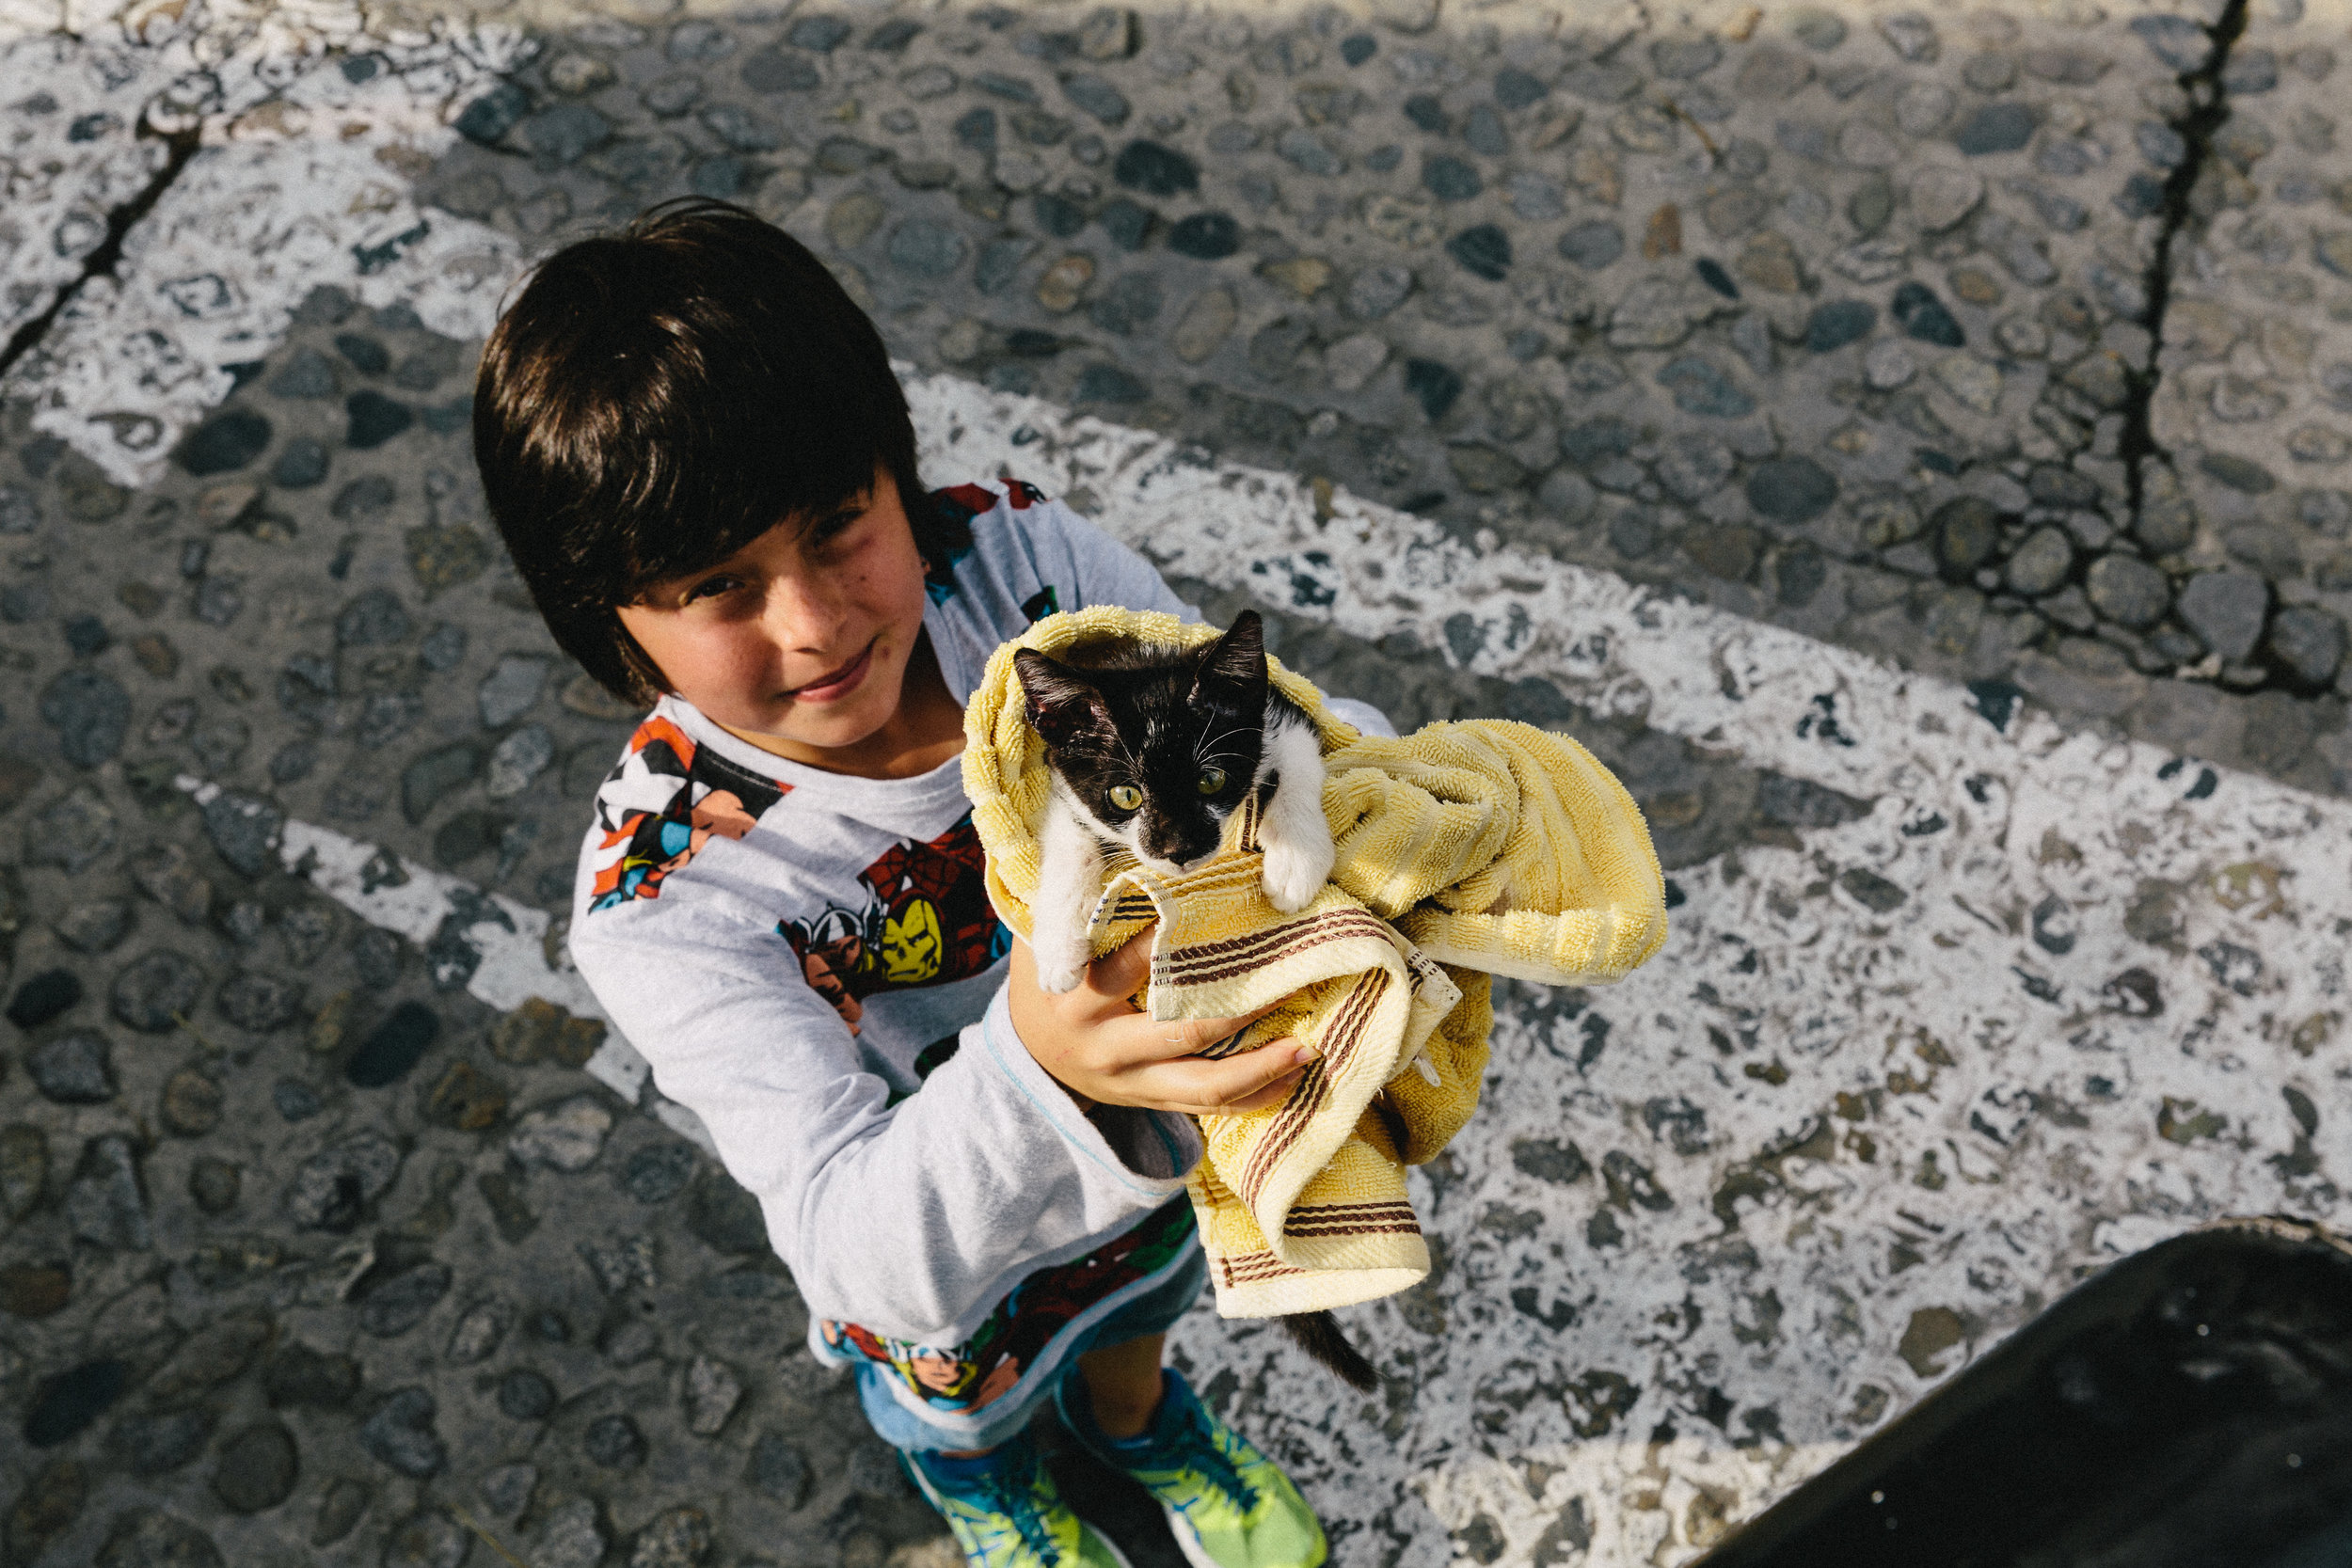 Melissa_Findley-KATHMANDU-Colombia-81